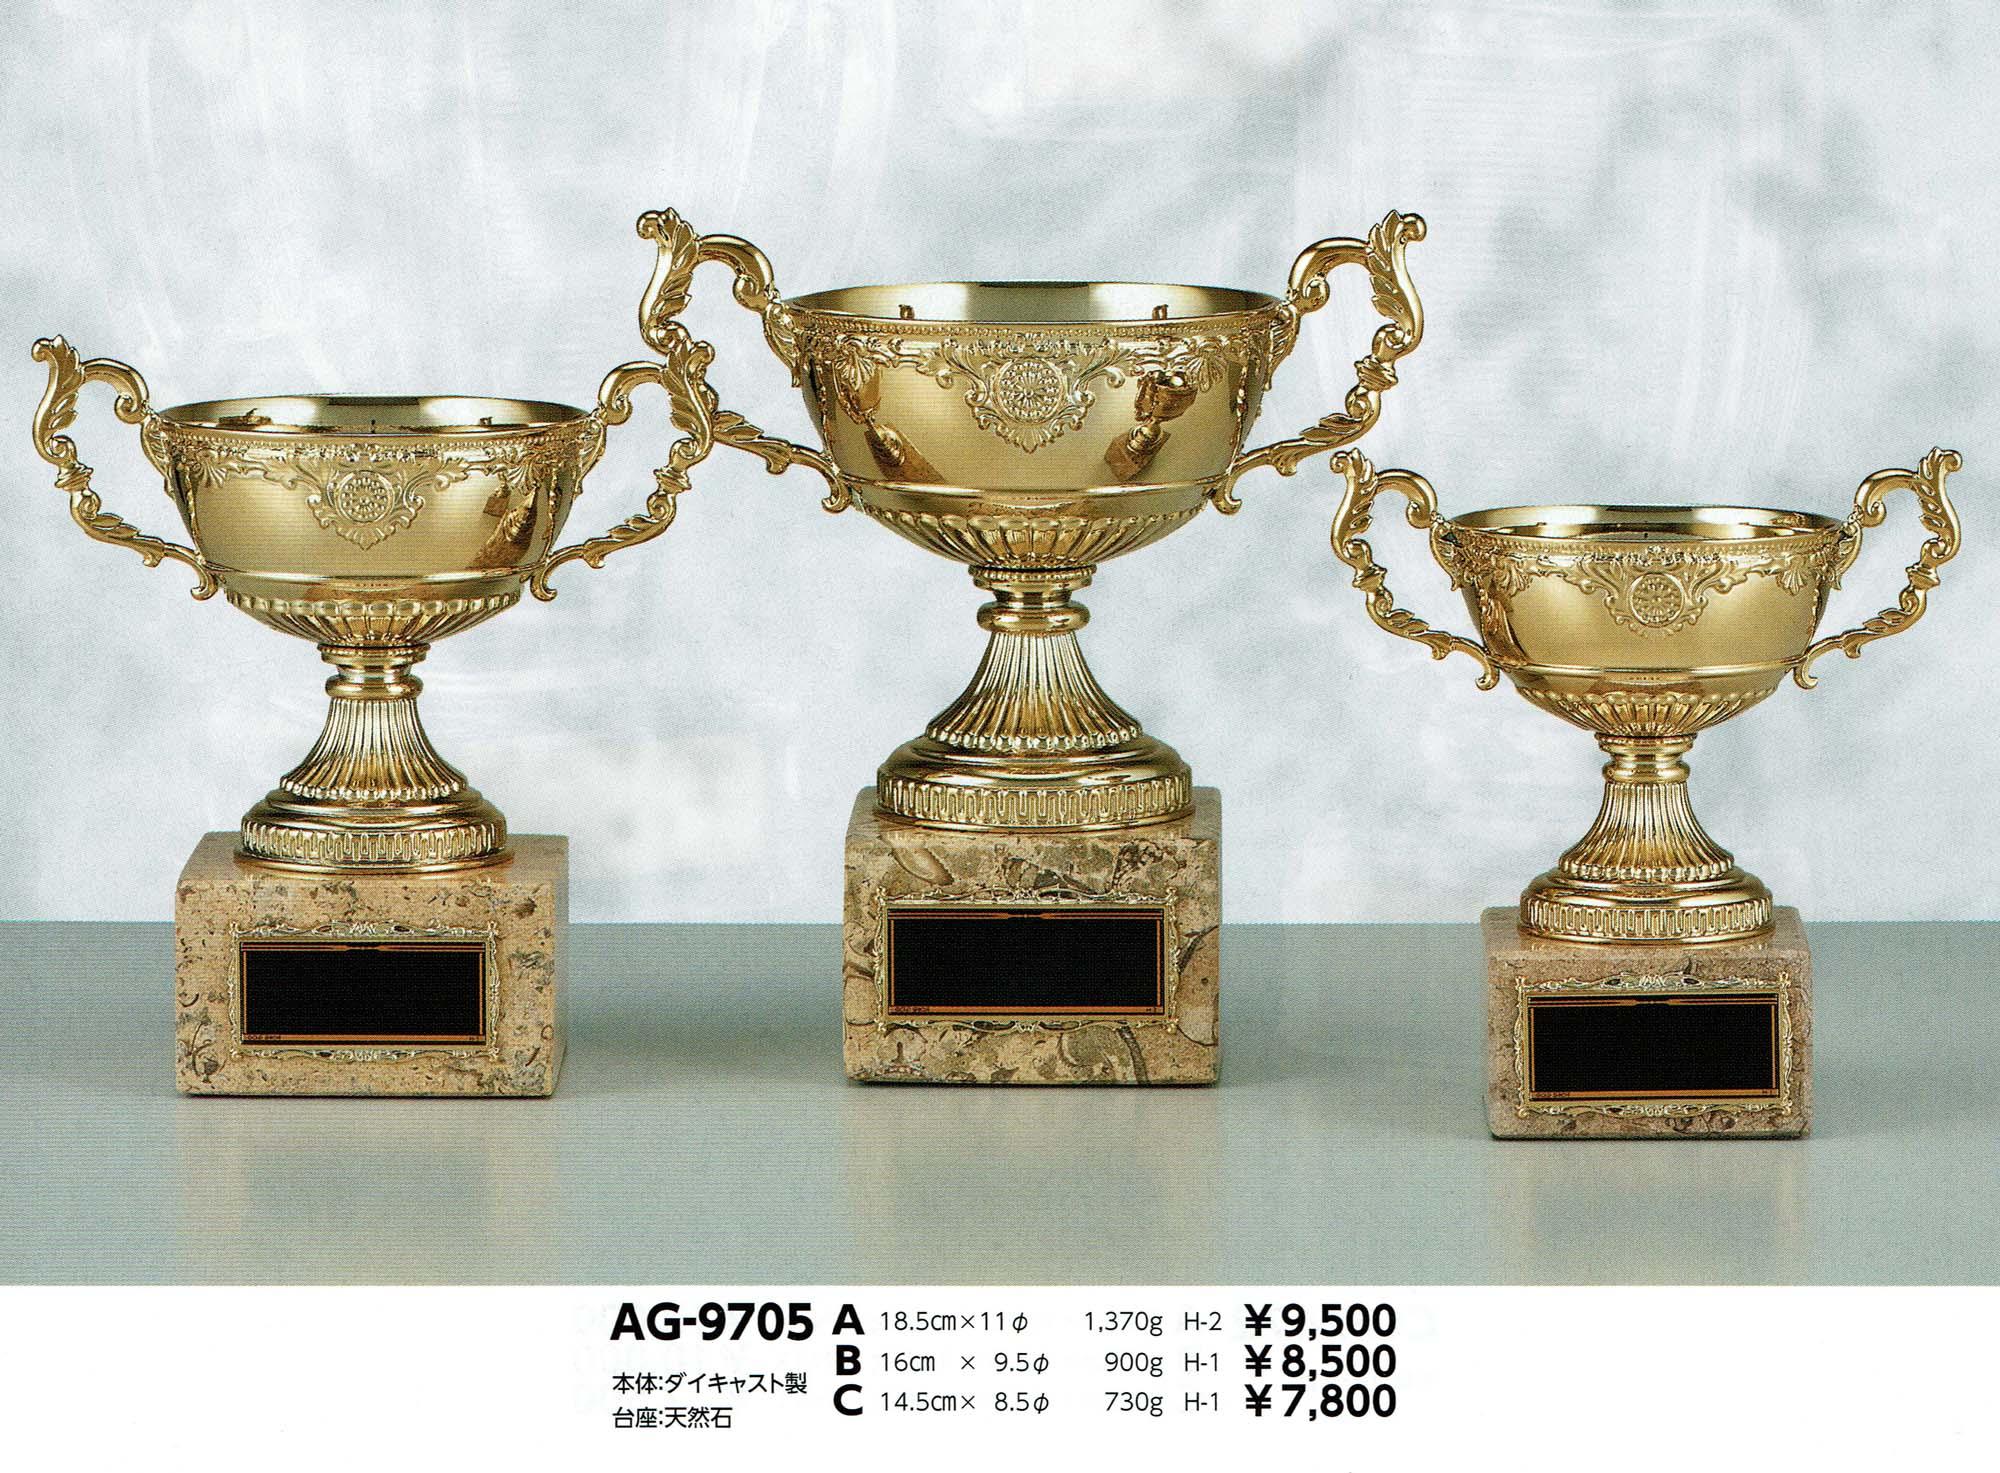 AG9705